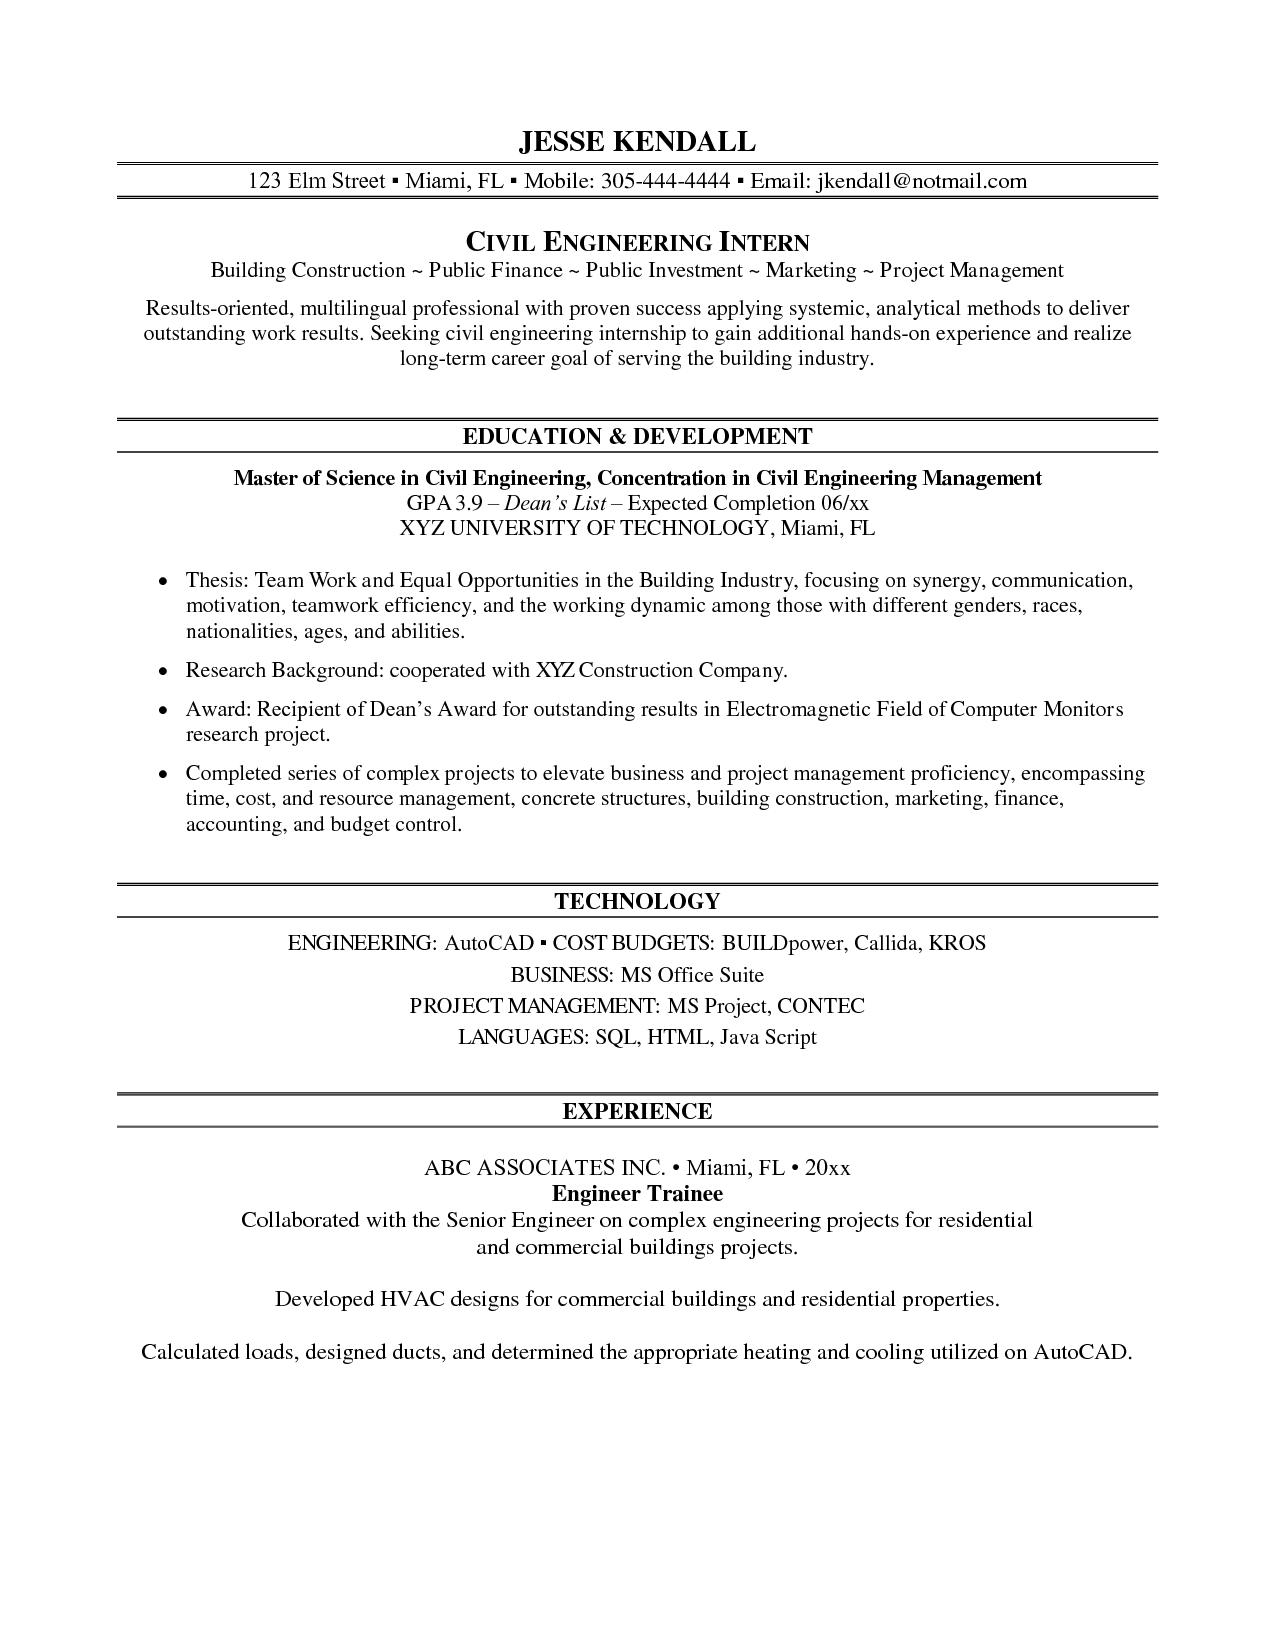 Internship On Resume Best Template Collection